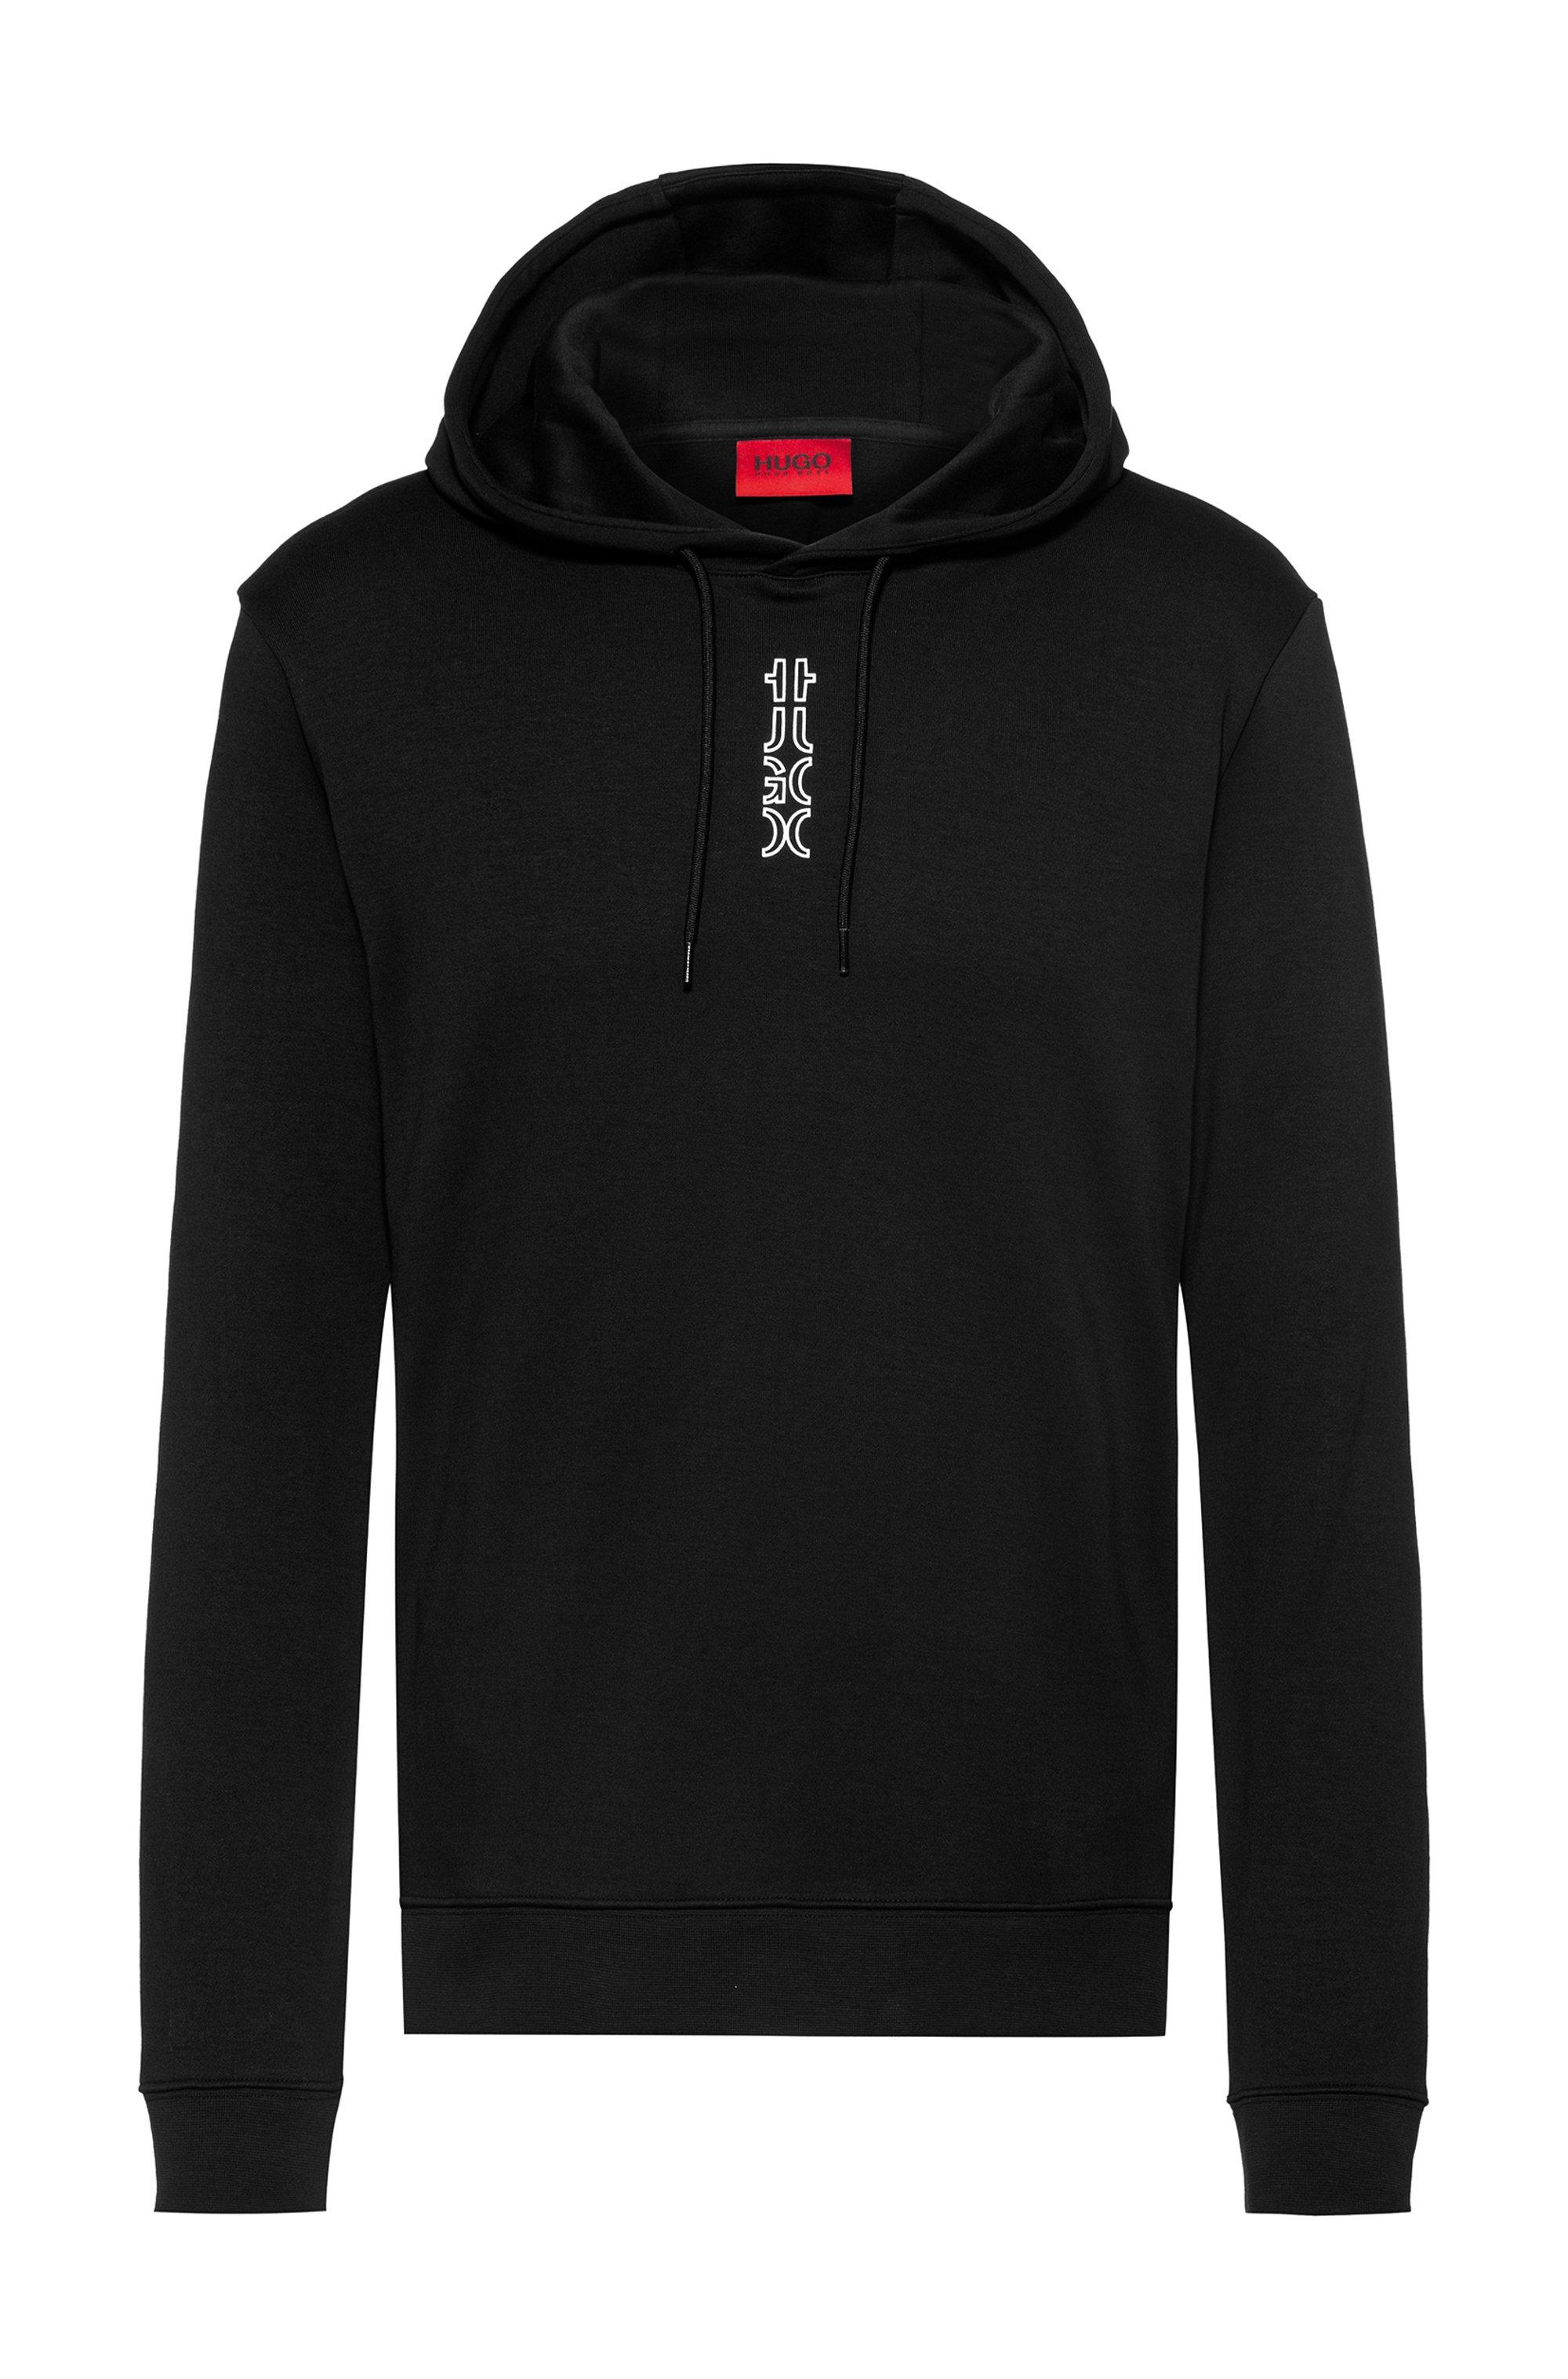 Interlock-cotton hooded sweatshirt with cropped logo, Noir